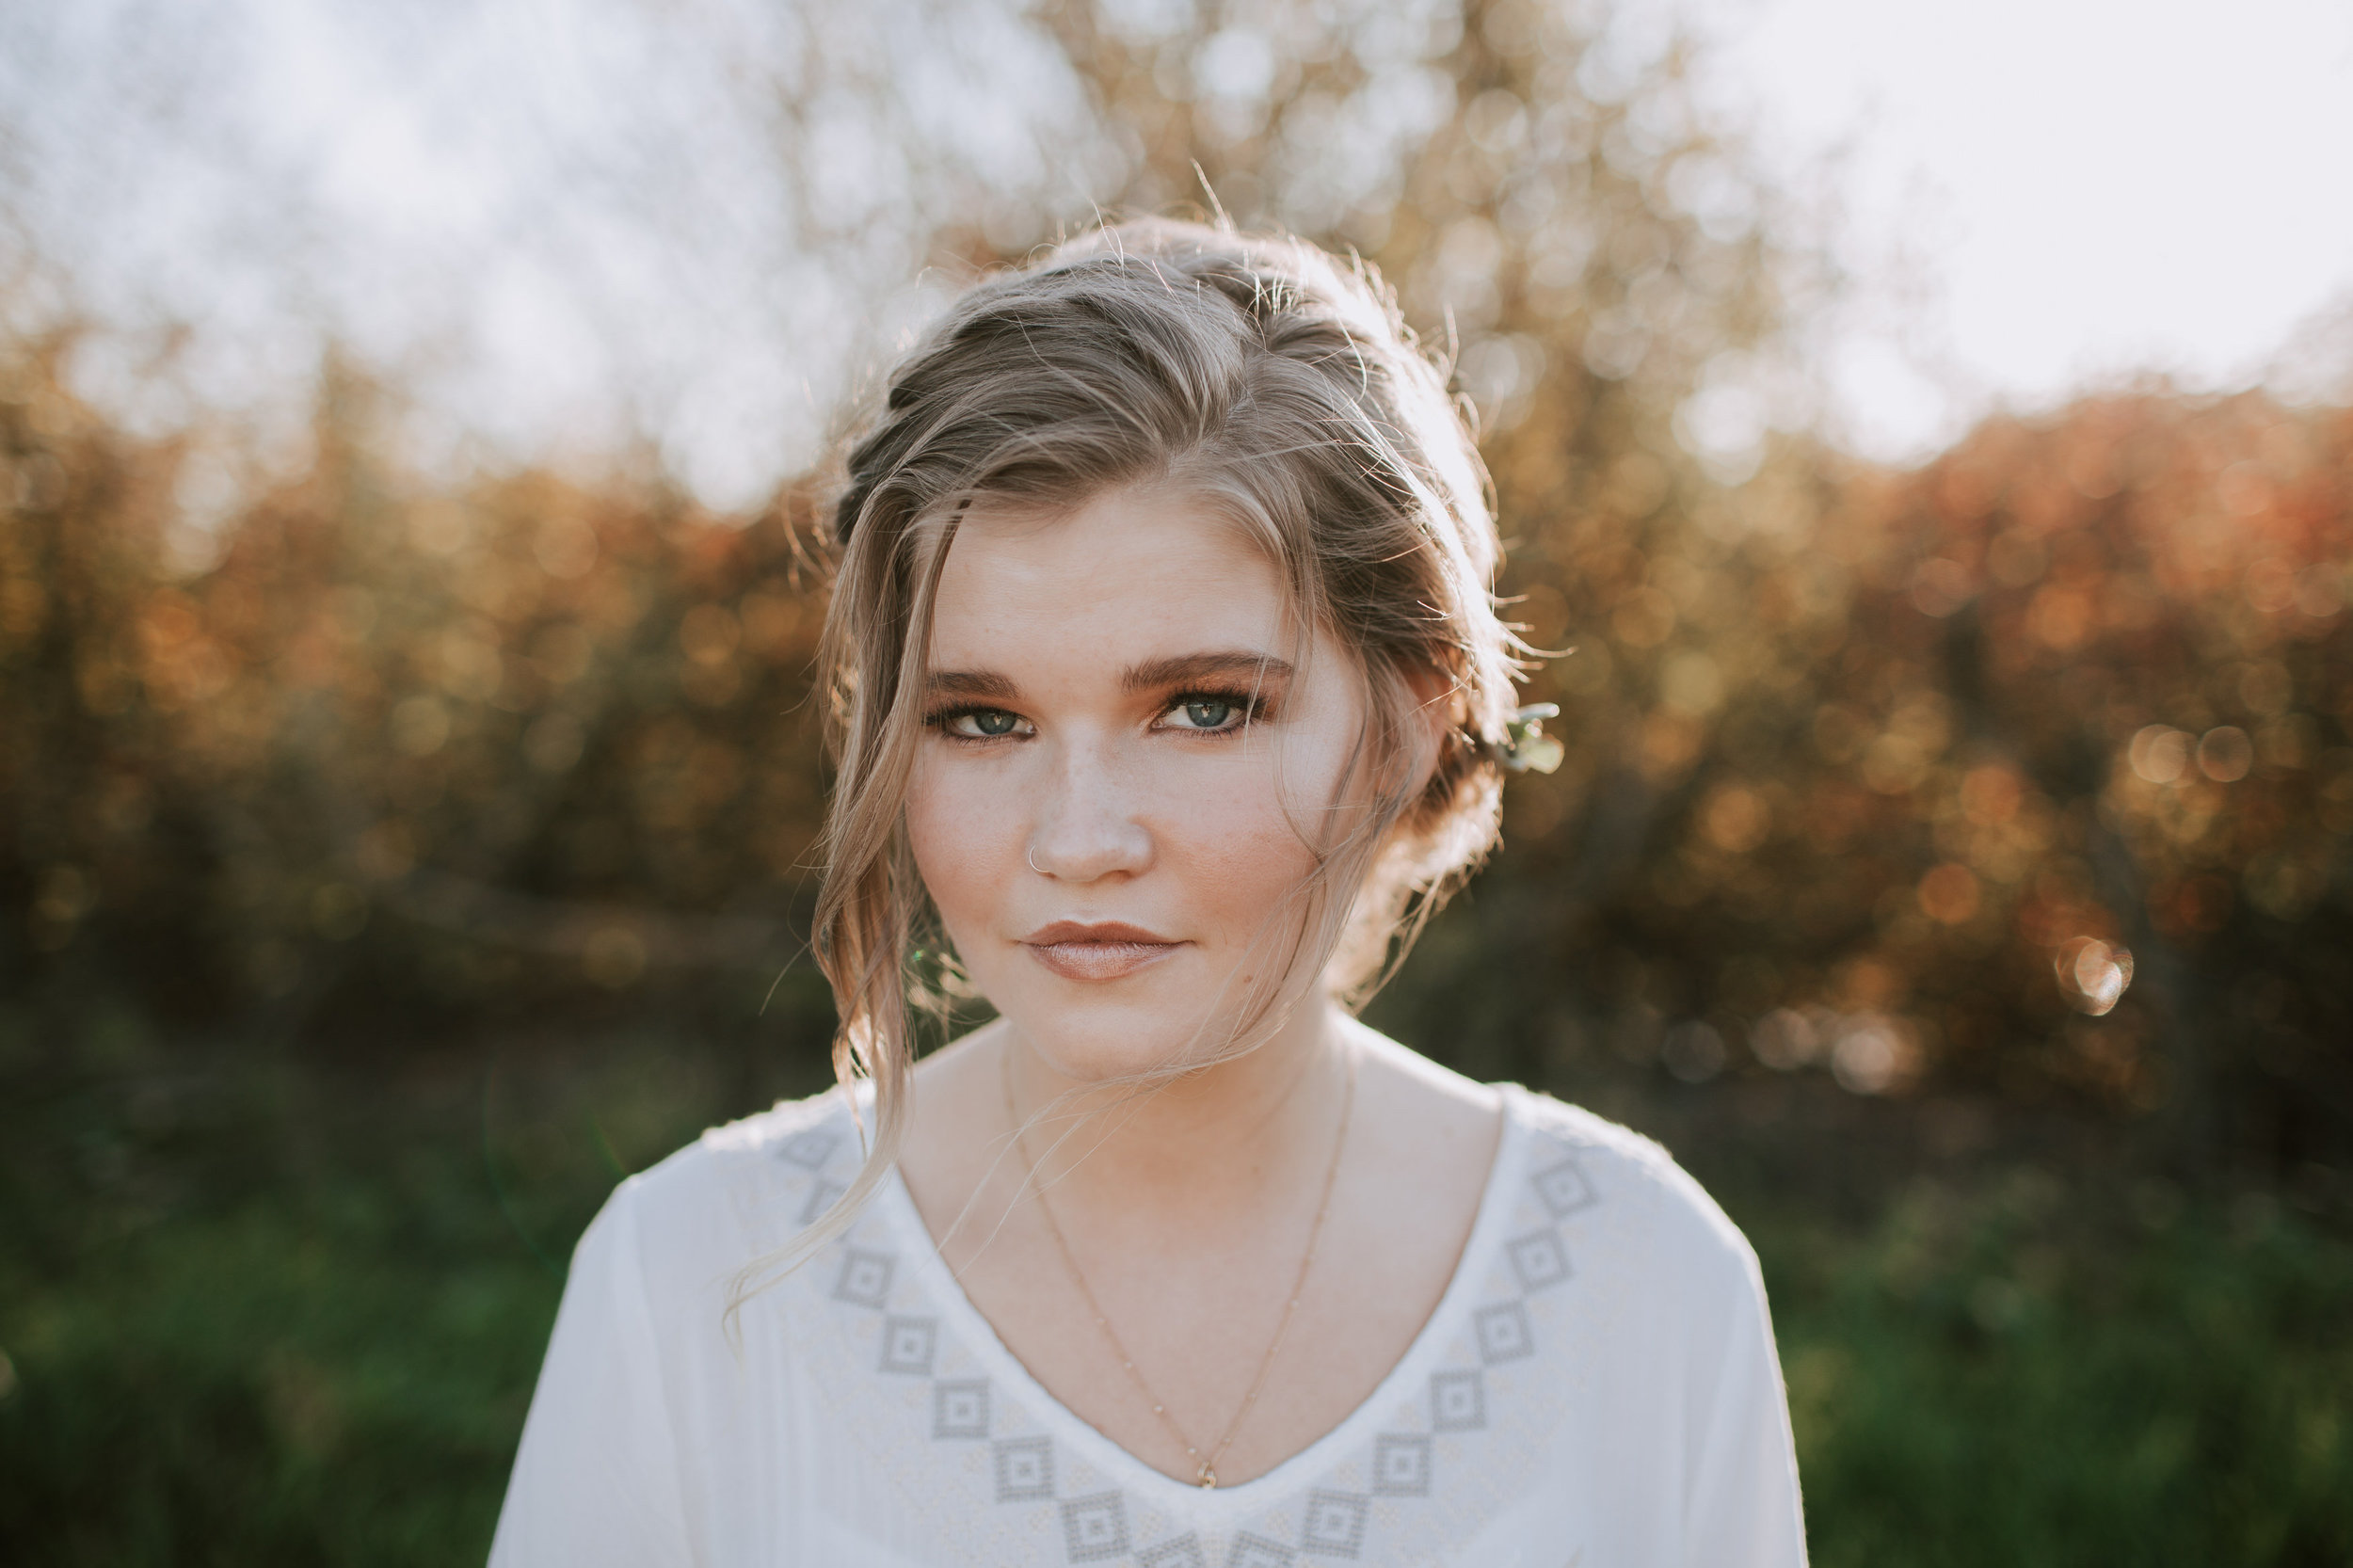 Bellingham bridal hair stylist, makeup artist, Roche Harbor